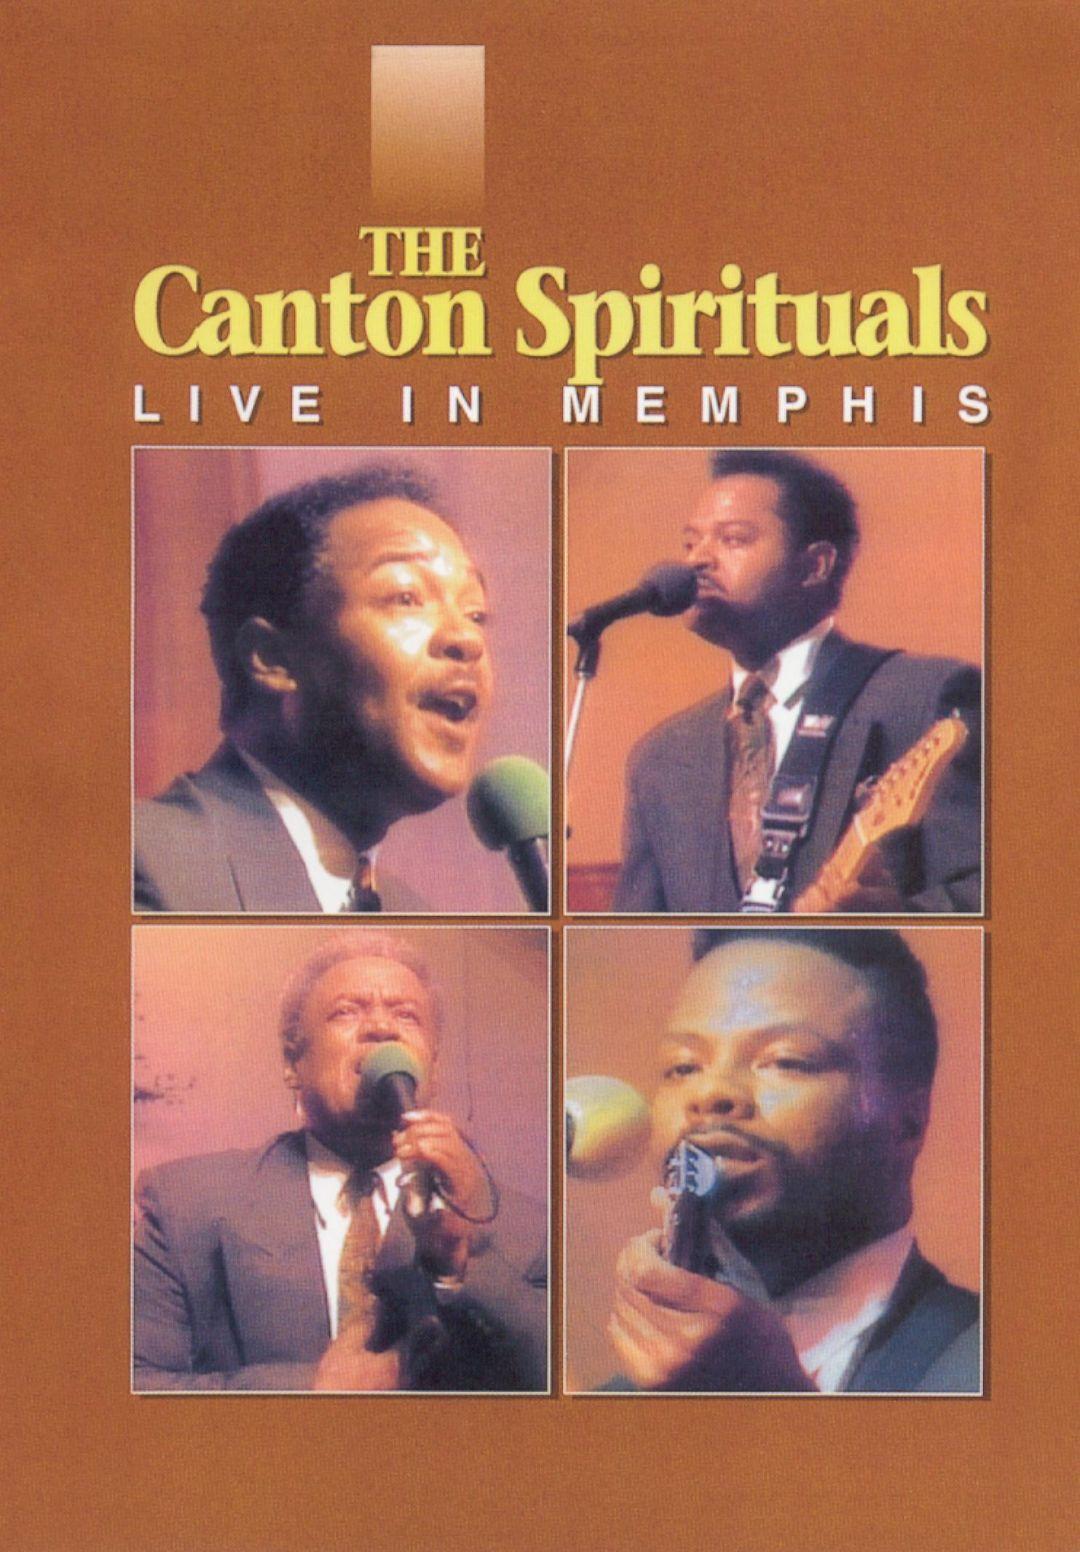 Live in Memphis [Video]